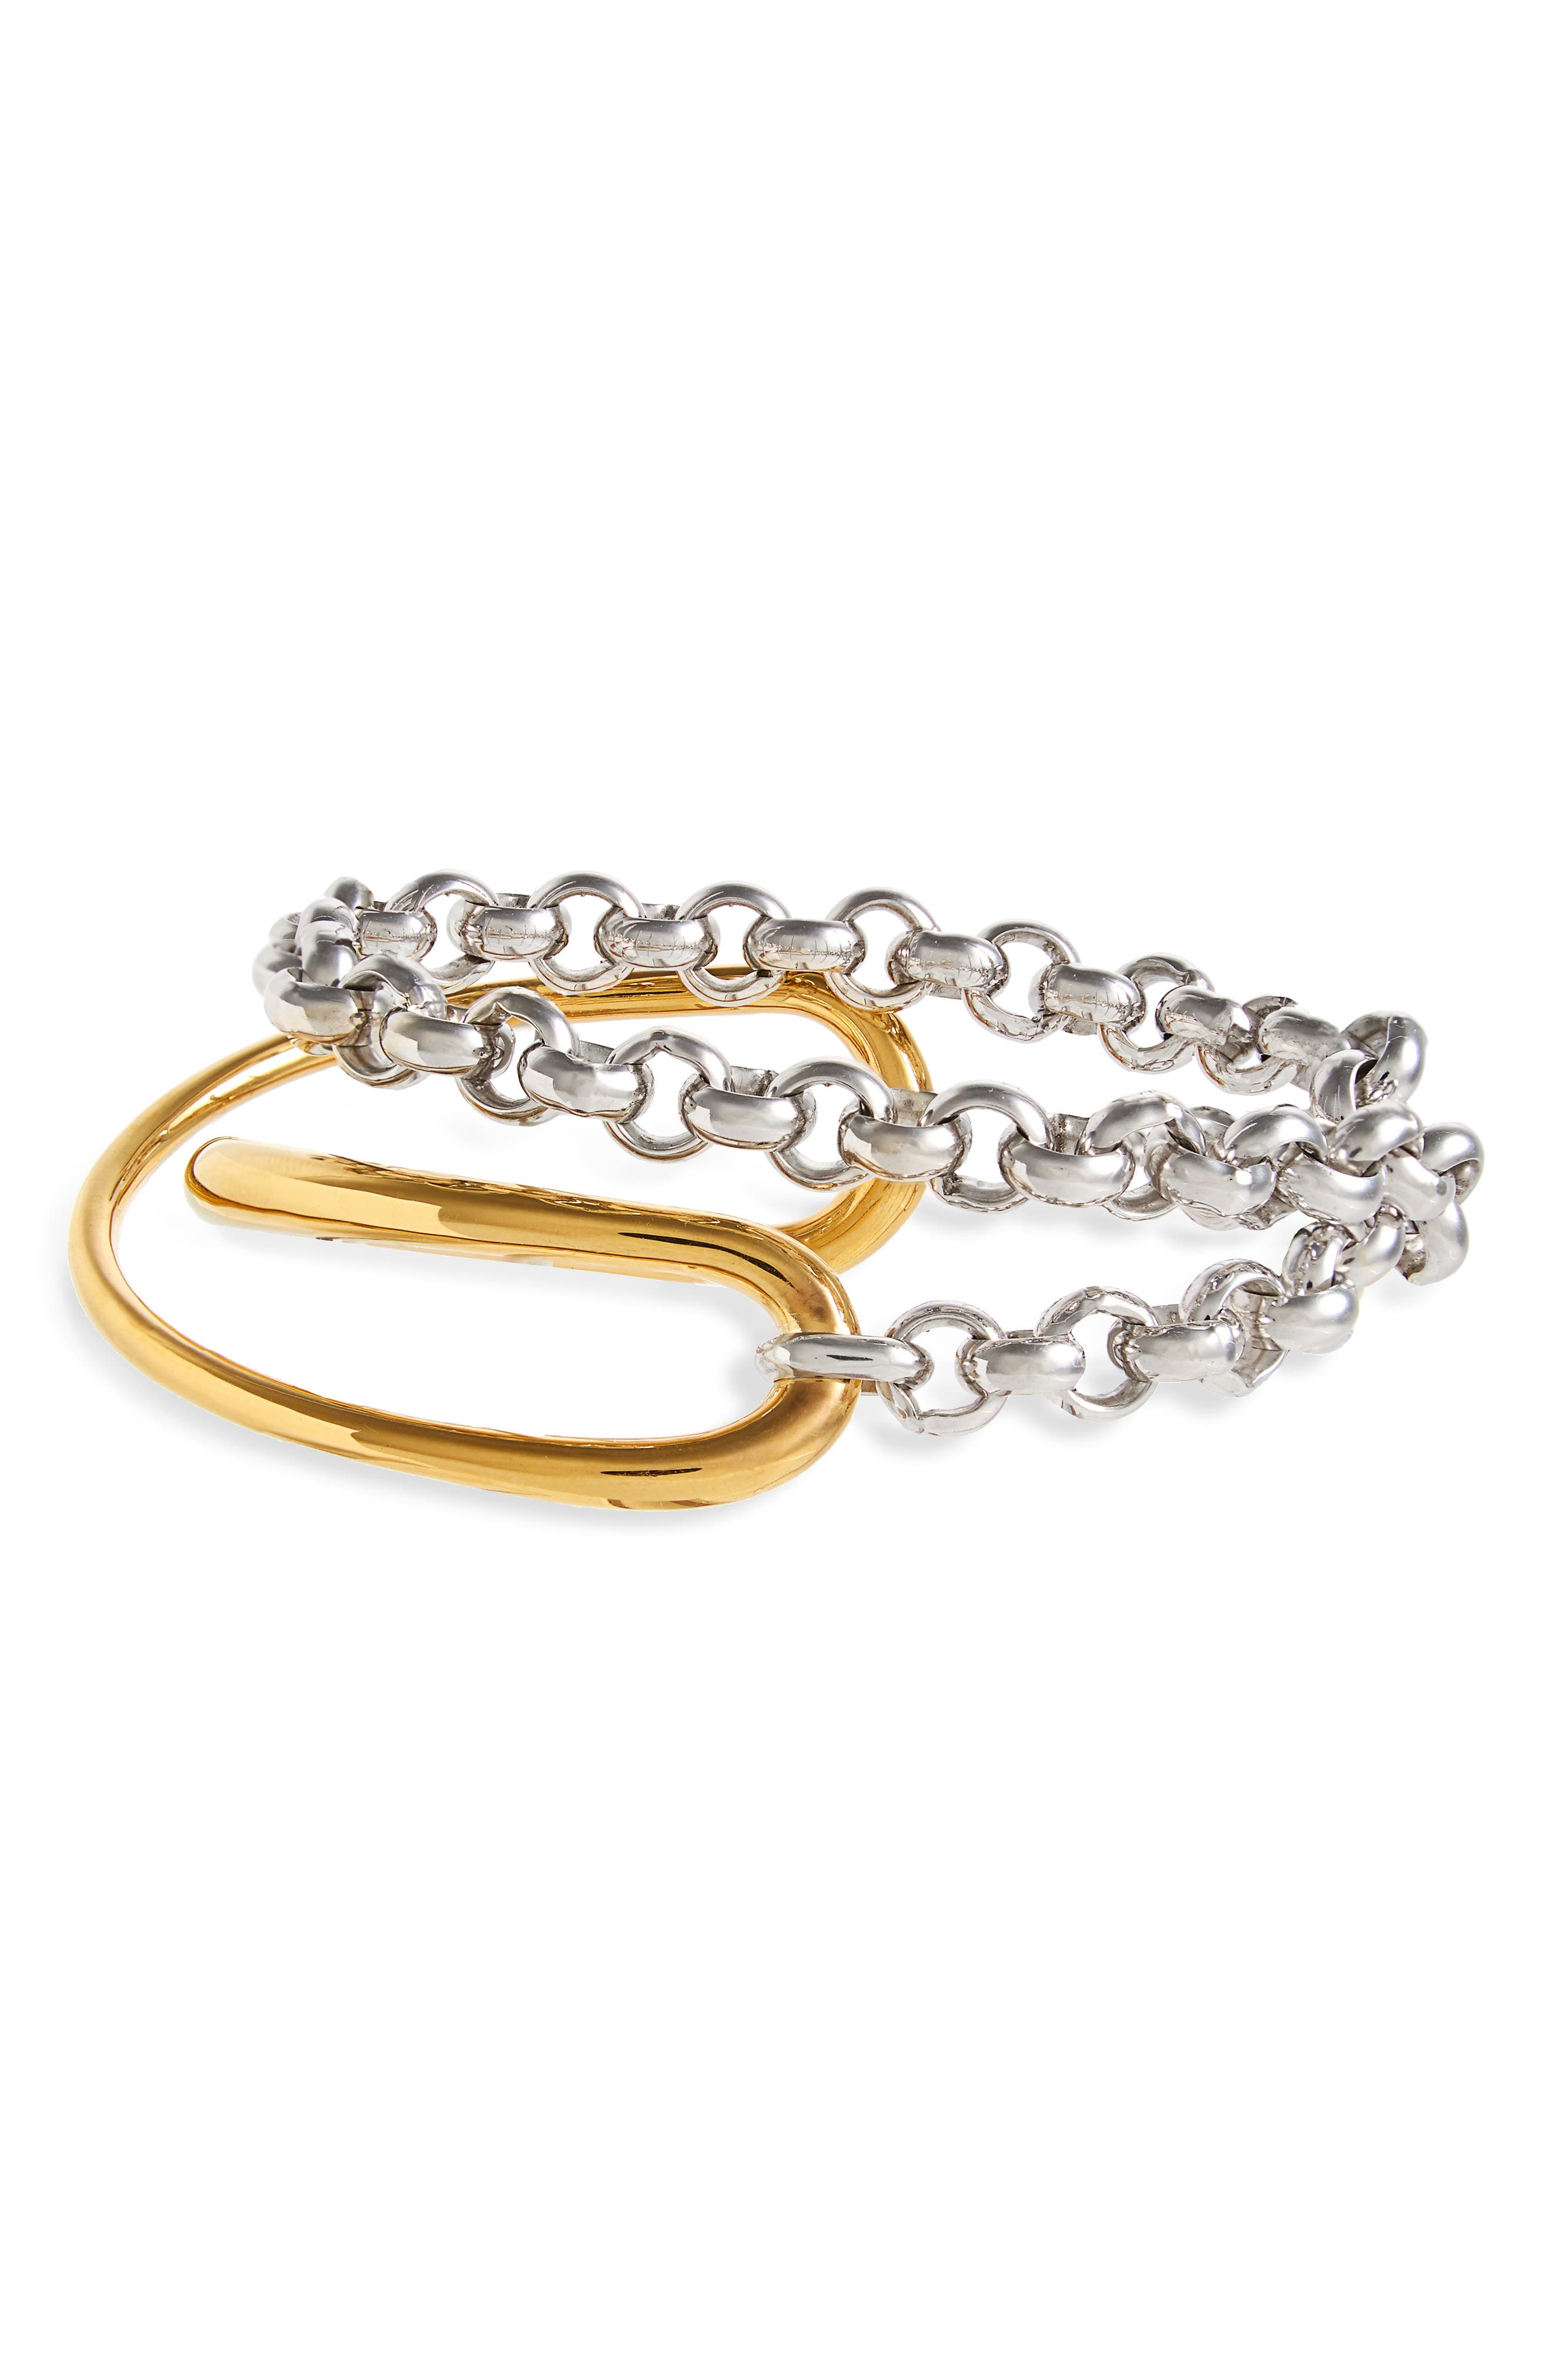 Charlotte Chenais Initial Chain Bracelet,                         Main,                         color, YELLOW SILVER